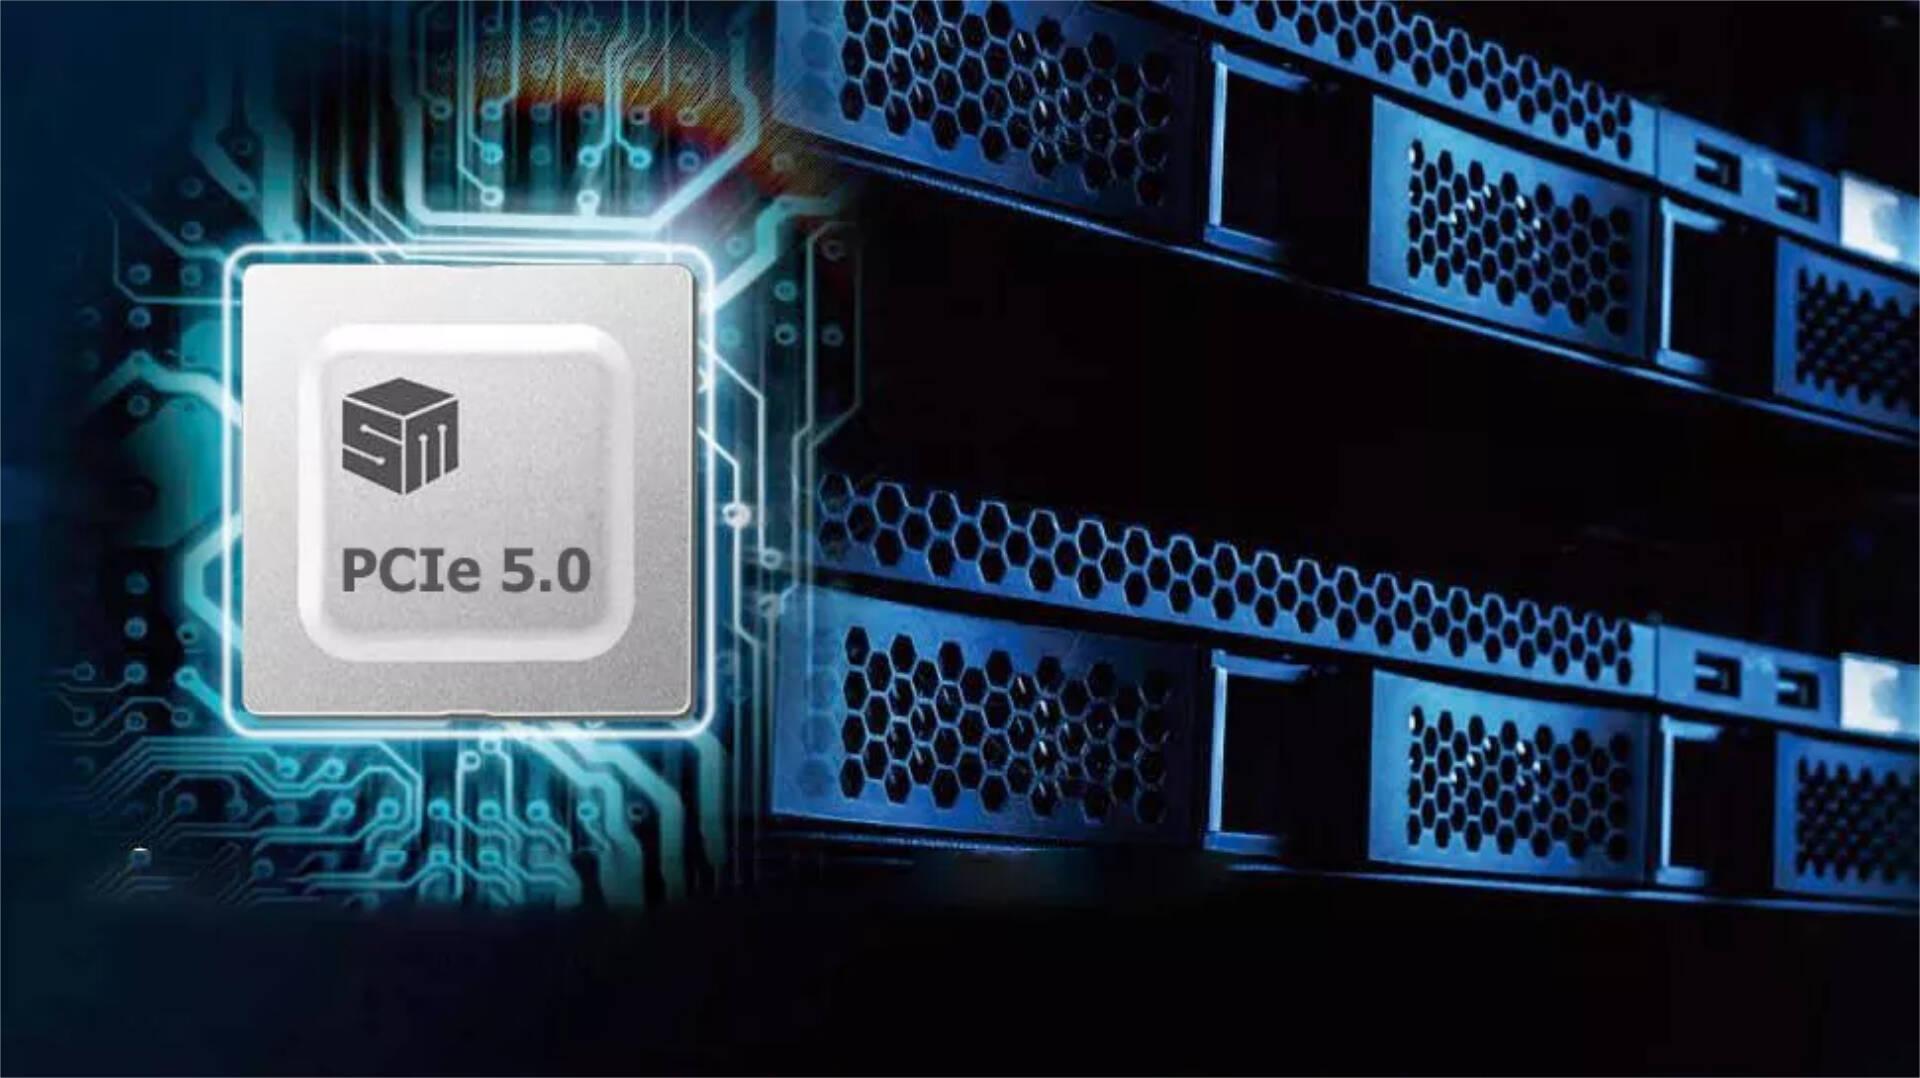 Silicon Motion PCI Express 5.0